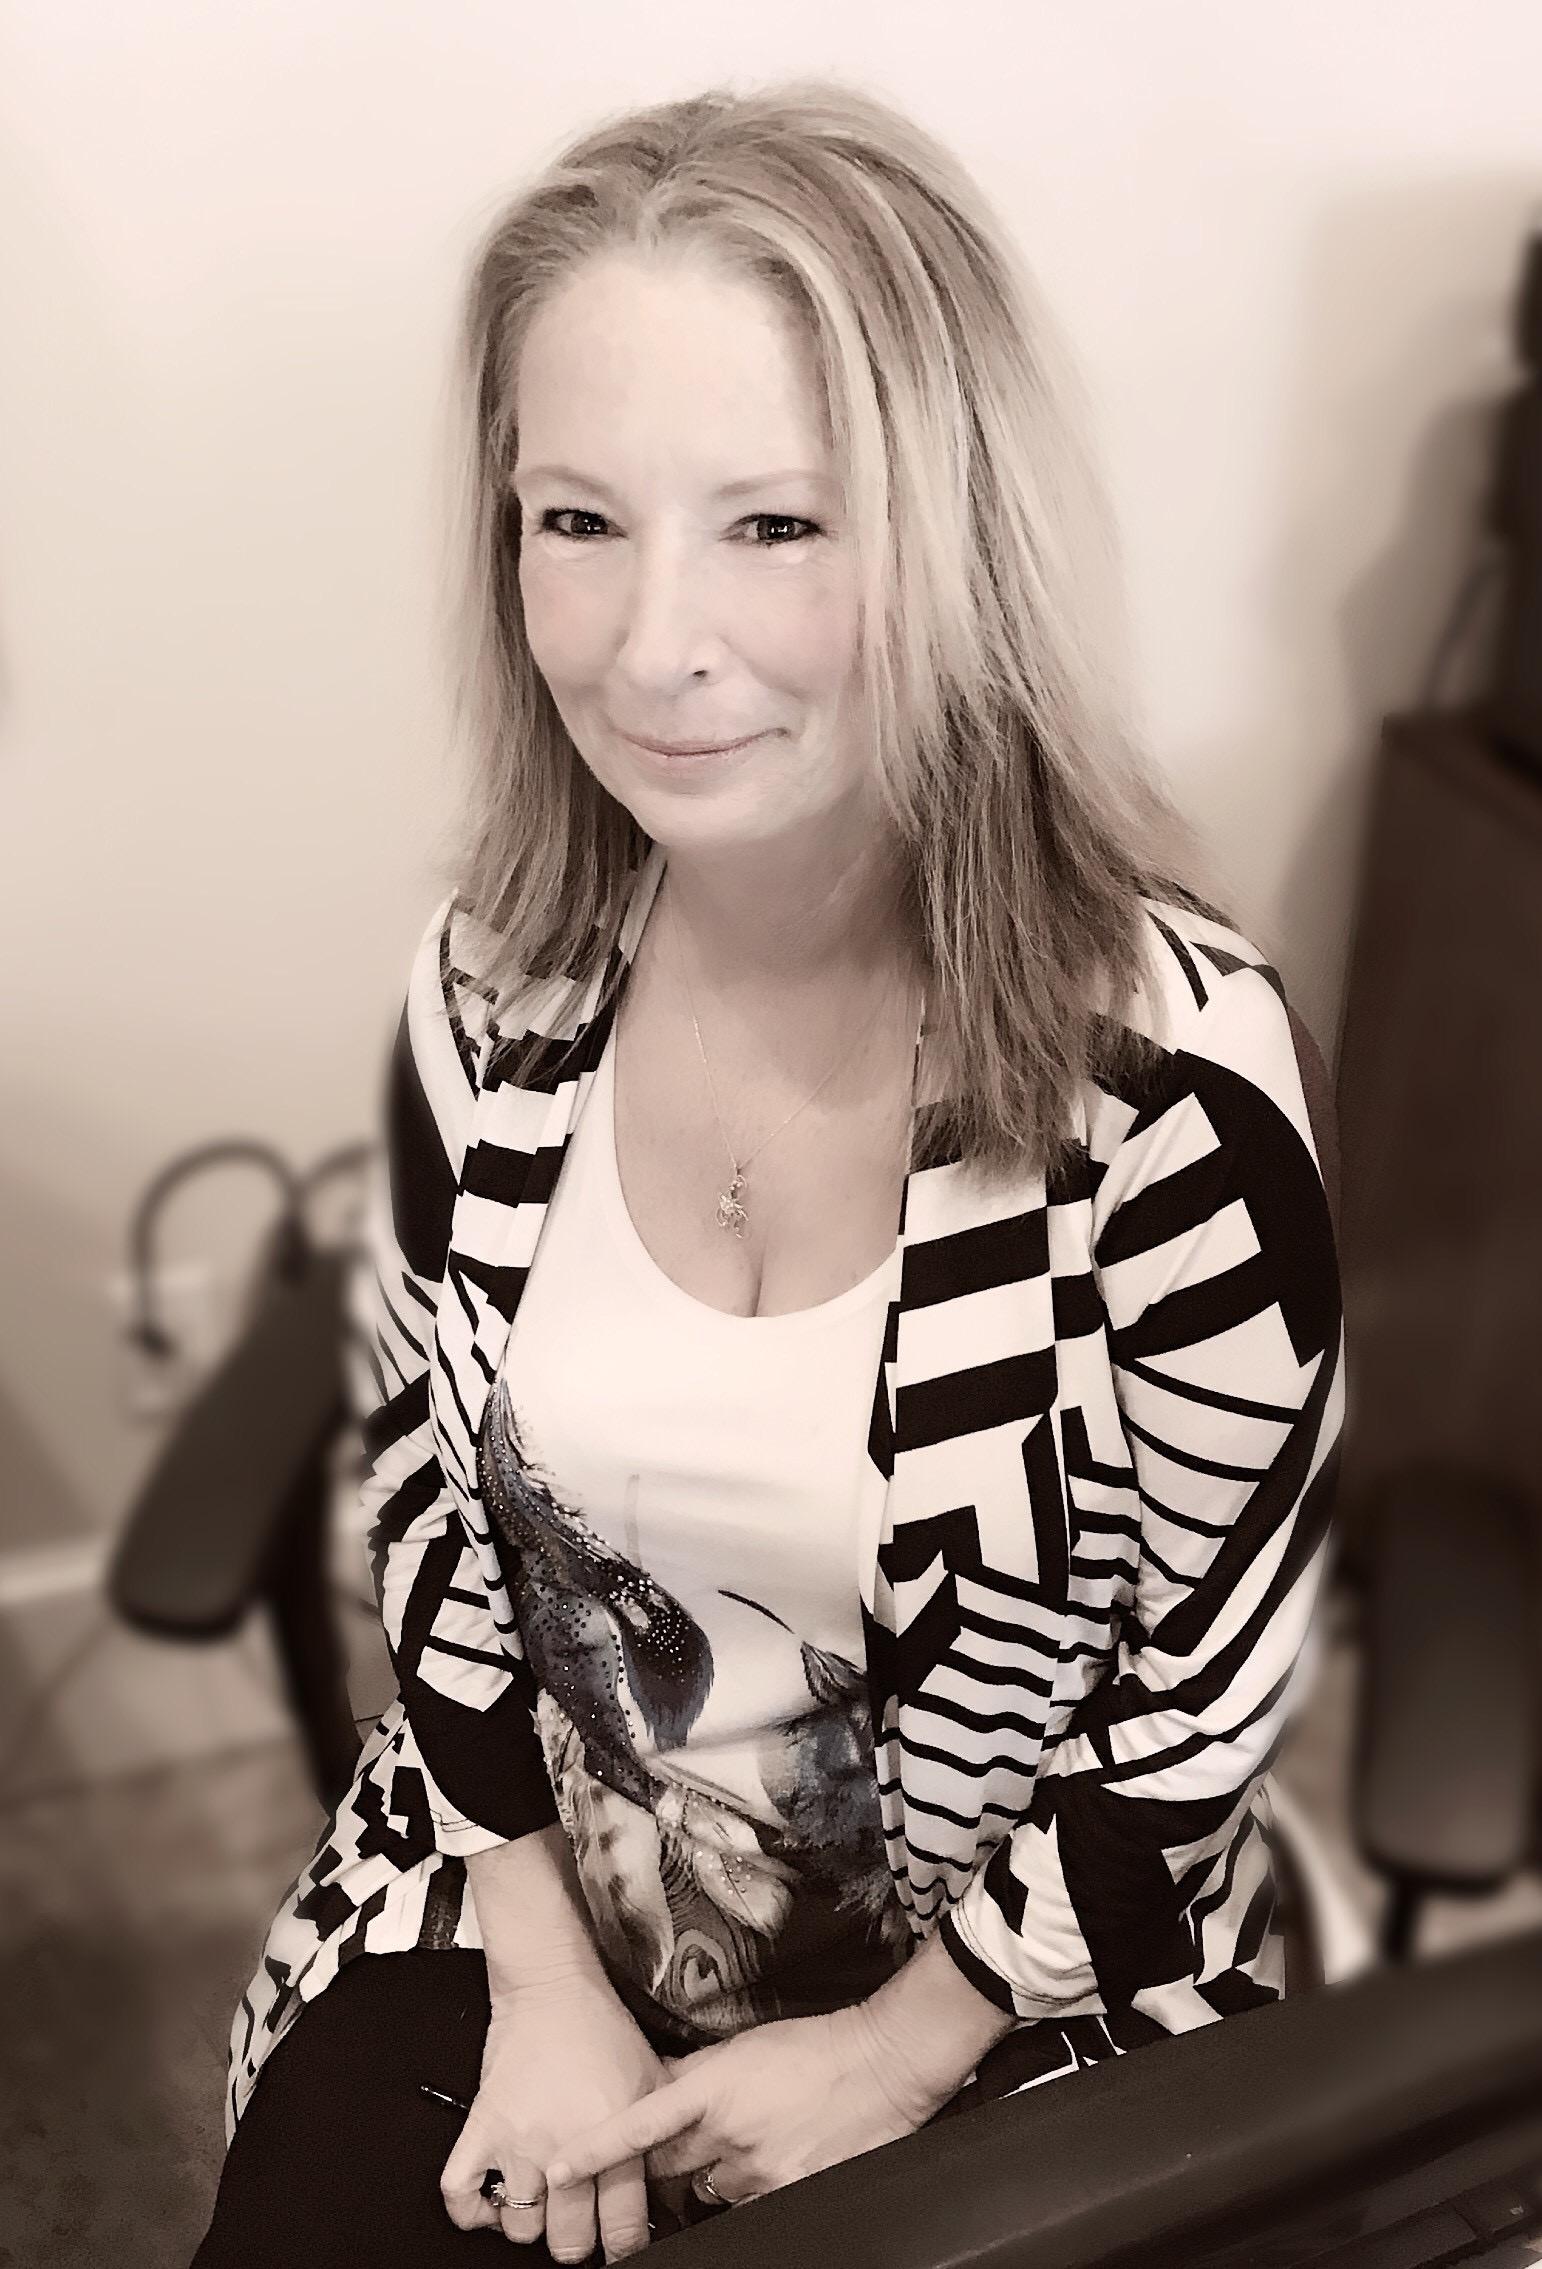 Wendy Moore wendy@daytonadivorce.com -